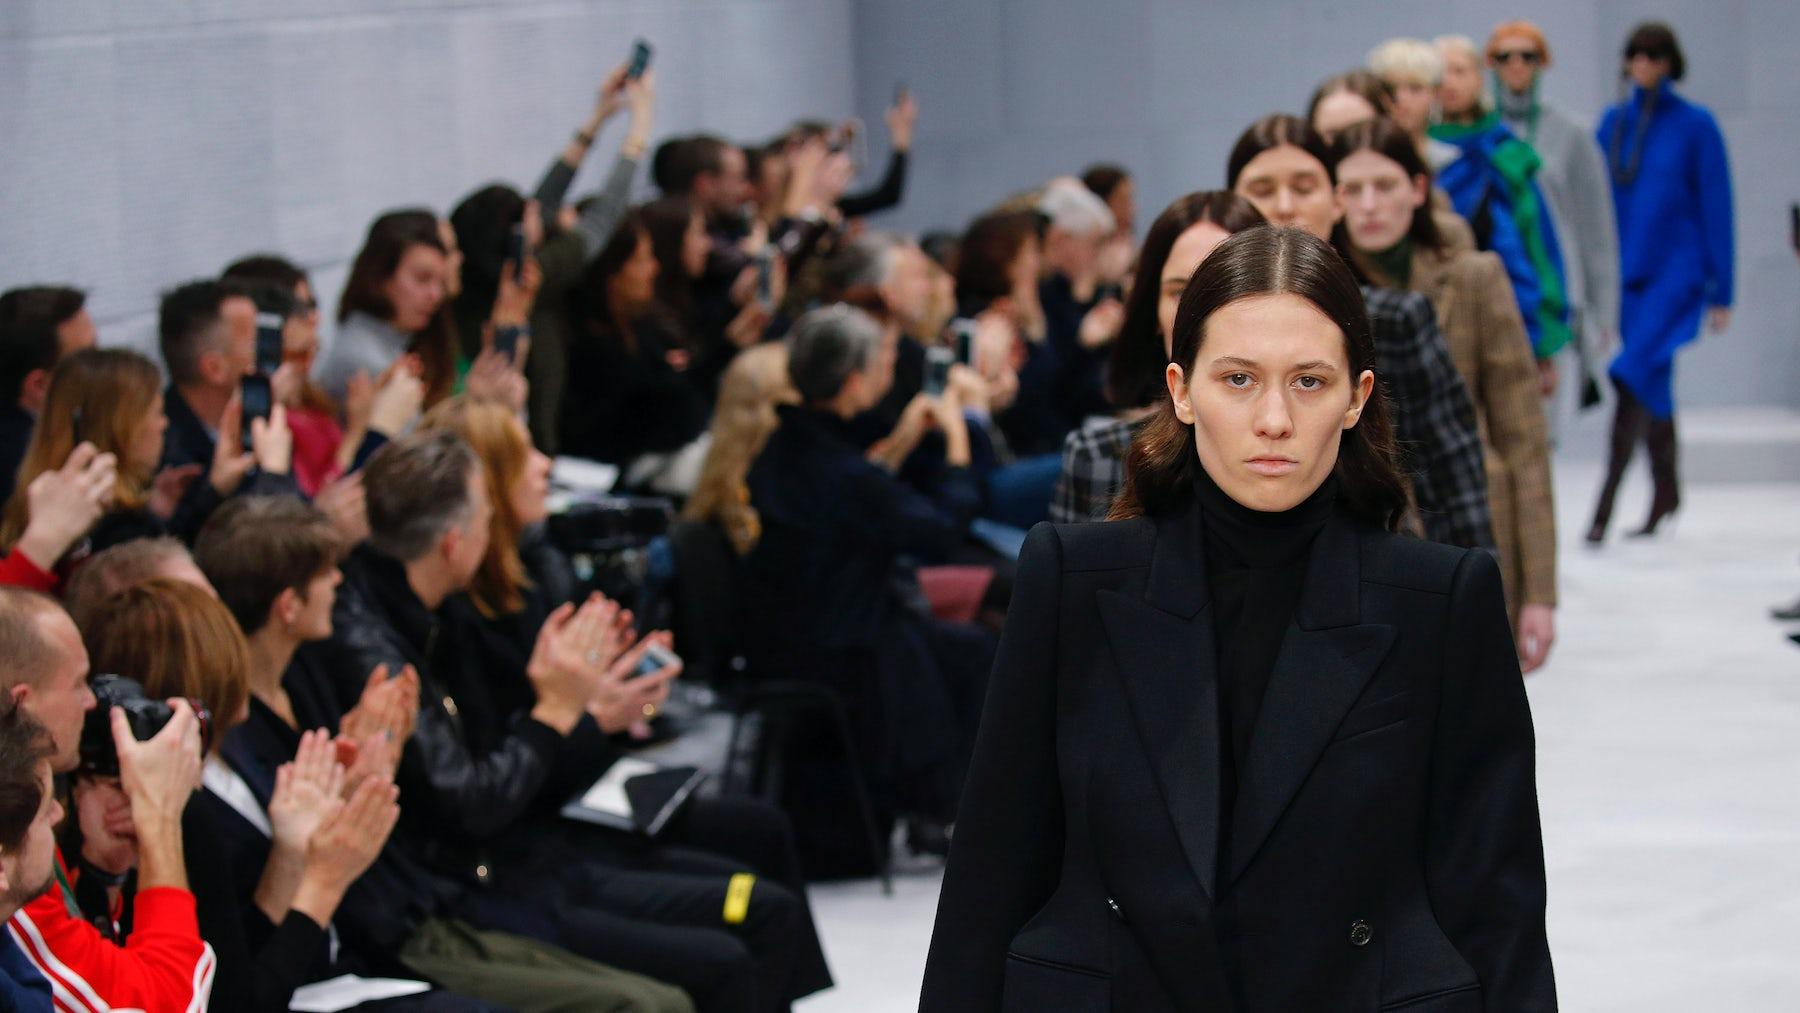 All white models walk the runway at Balenciaga's Autumn/Winter 2016 show | Source: InDigital